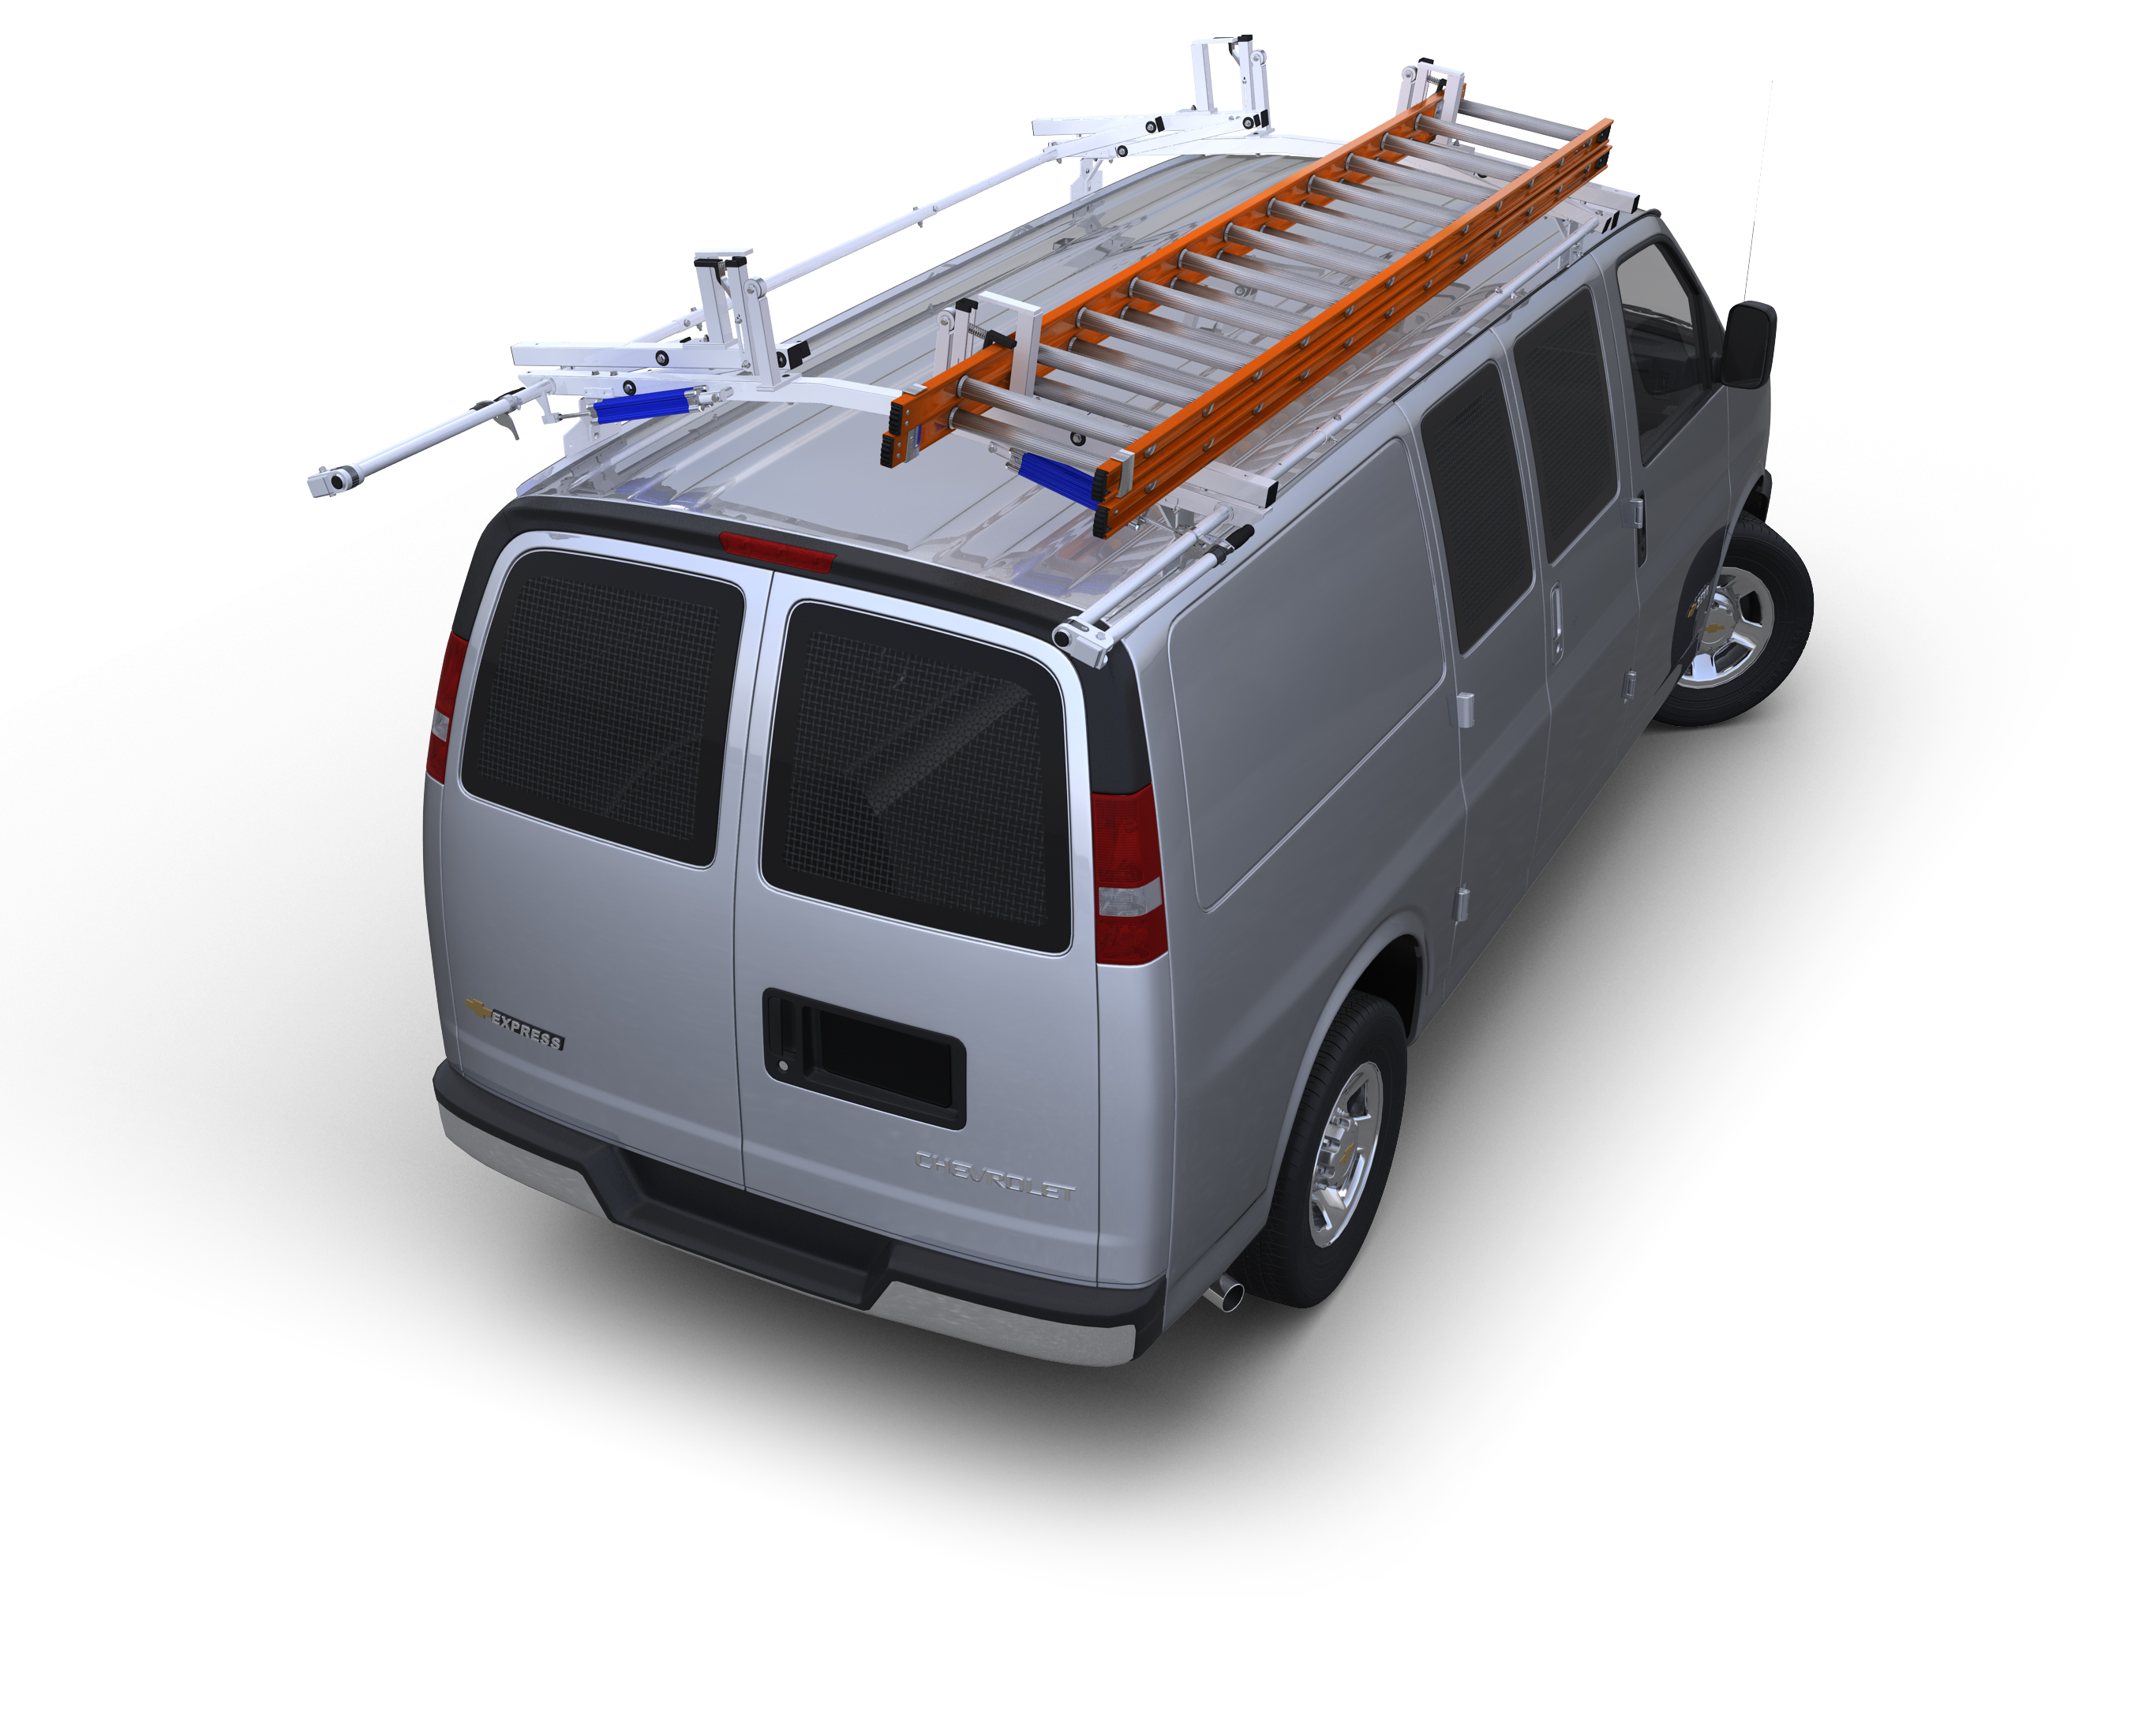 "Sprinter Hot Dip Galvanized Cargo Carrier Rack - 14"" for 170"" Wheel Base Van"